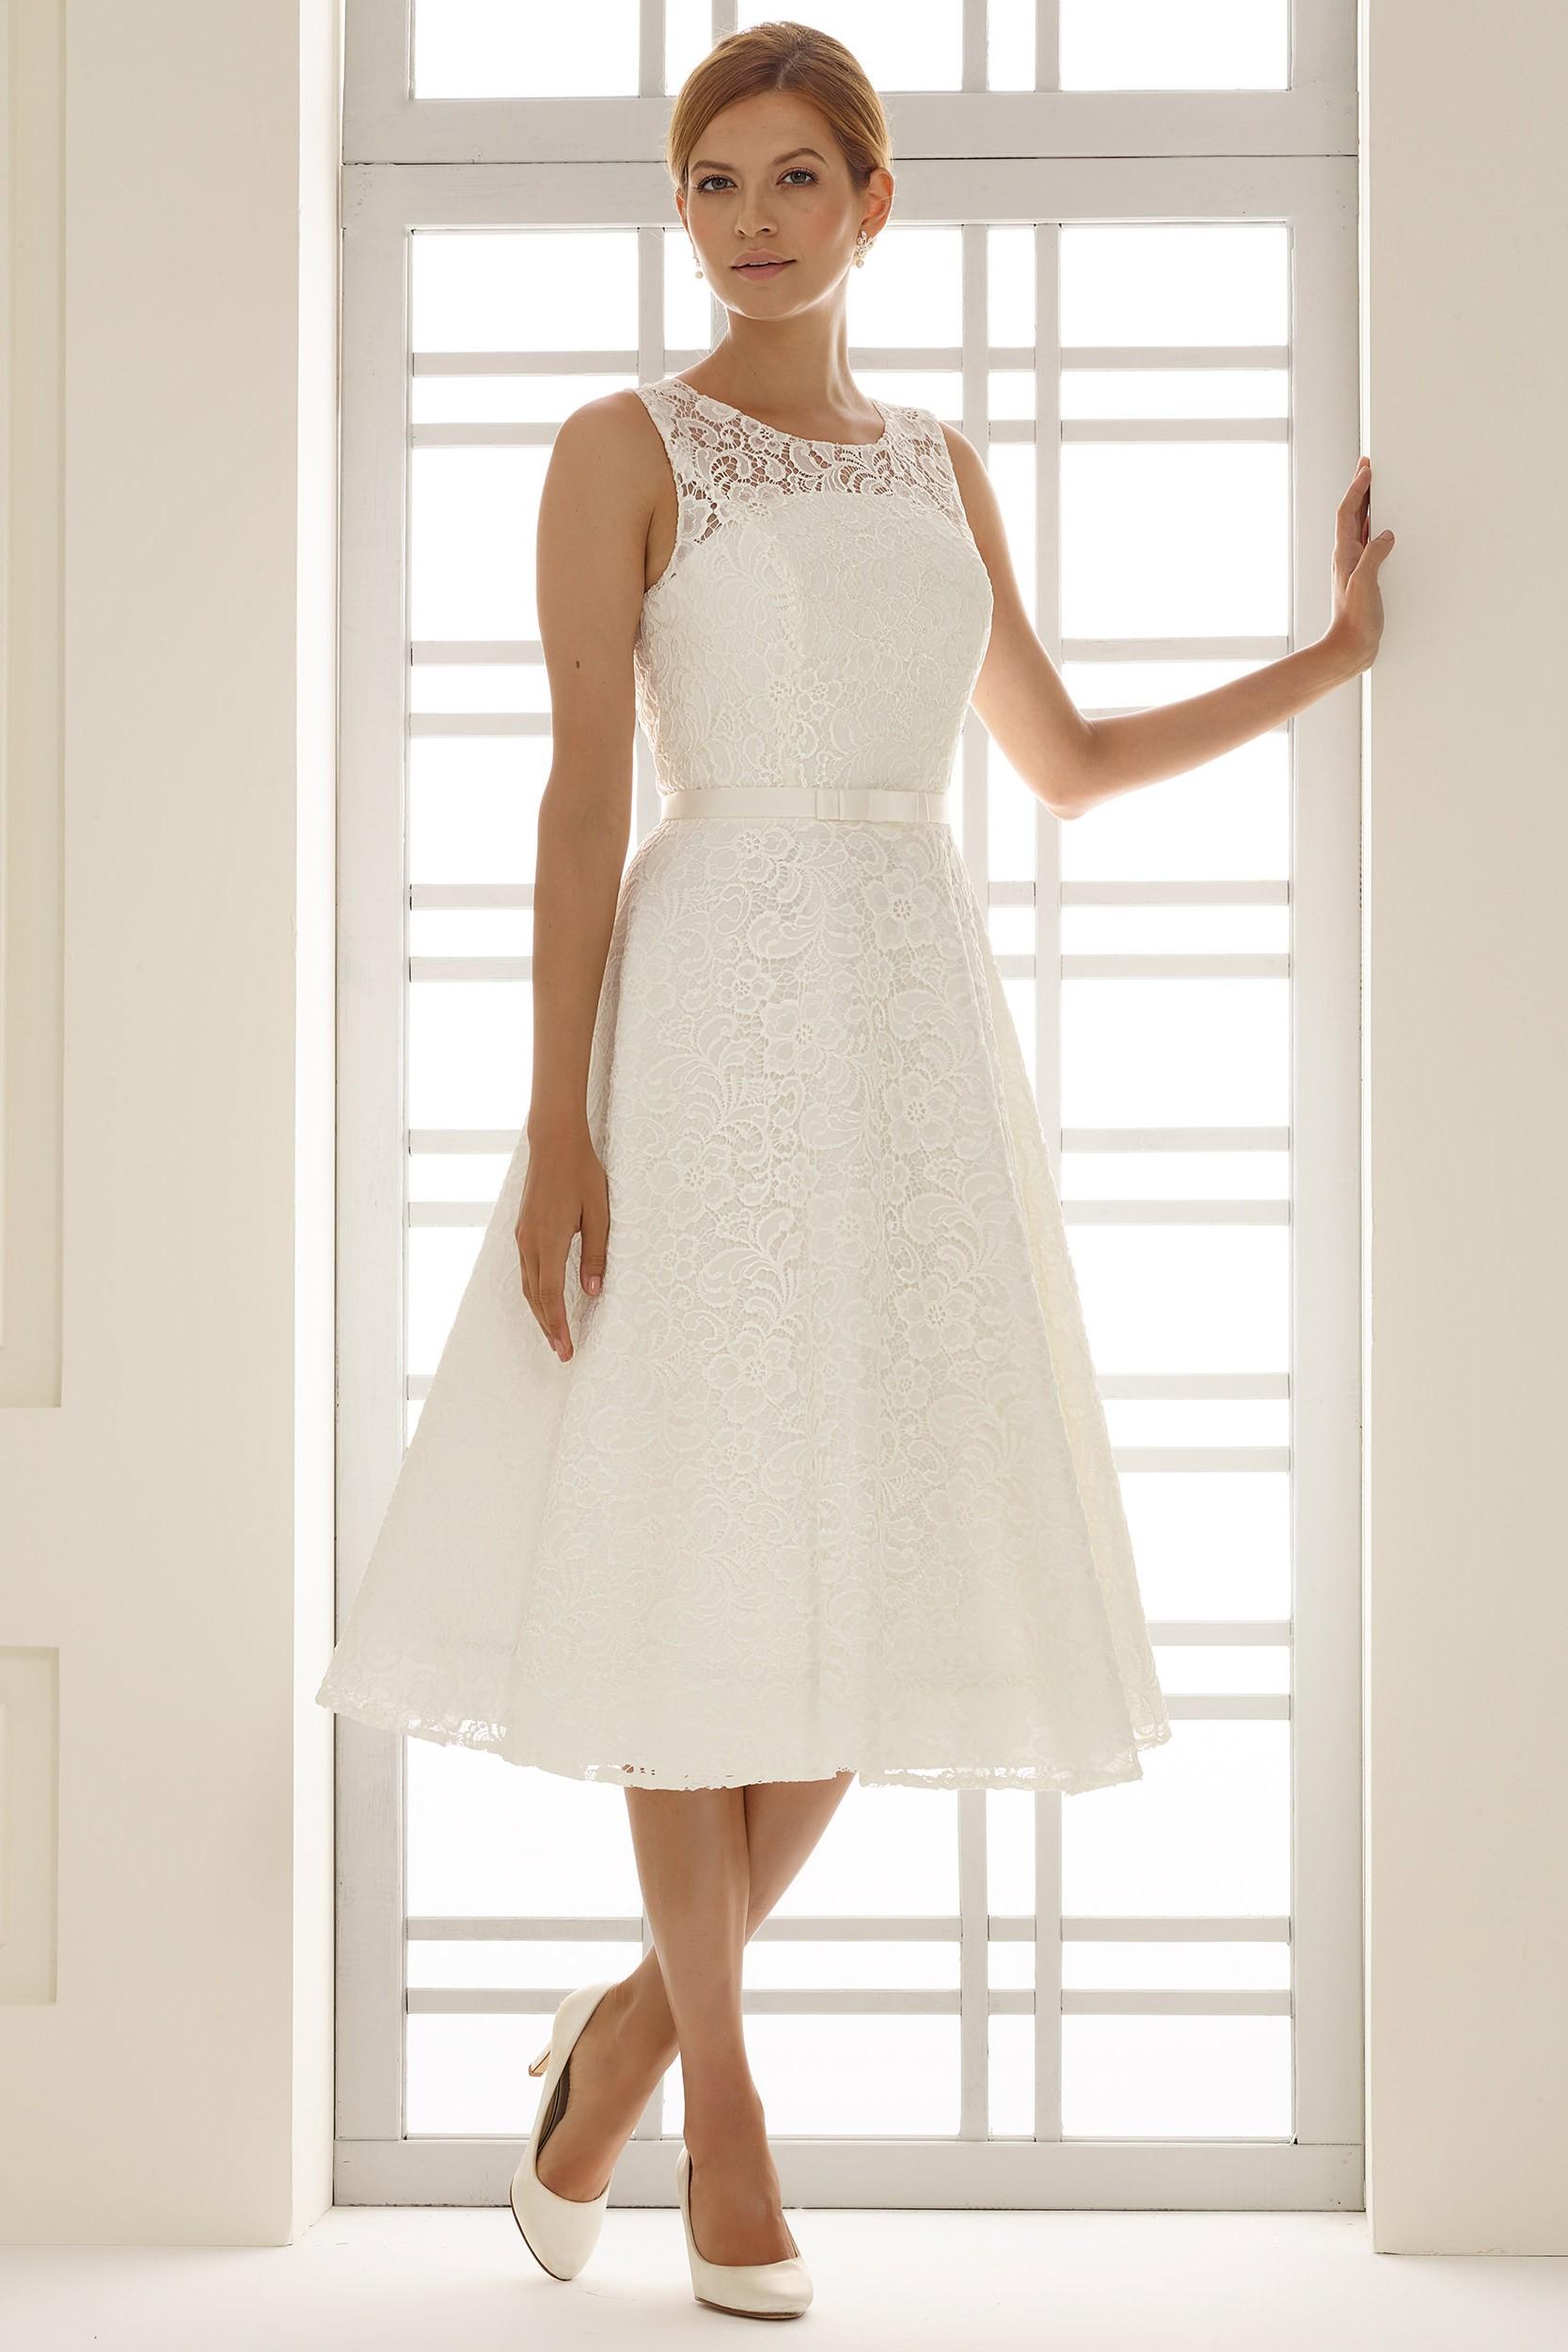 caba379900a2 Civil Wedding Collection- νυφικά για πολιτικό γάμο- Pink Cloud